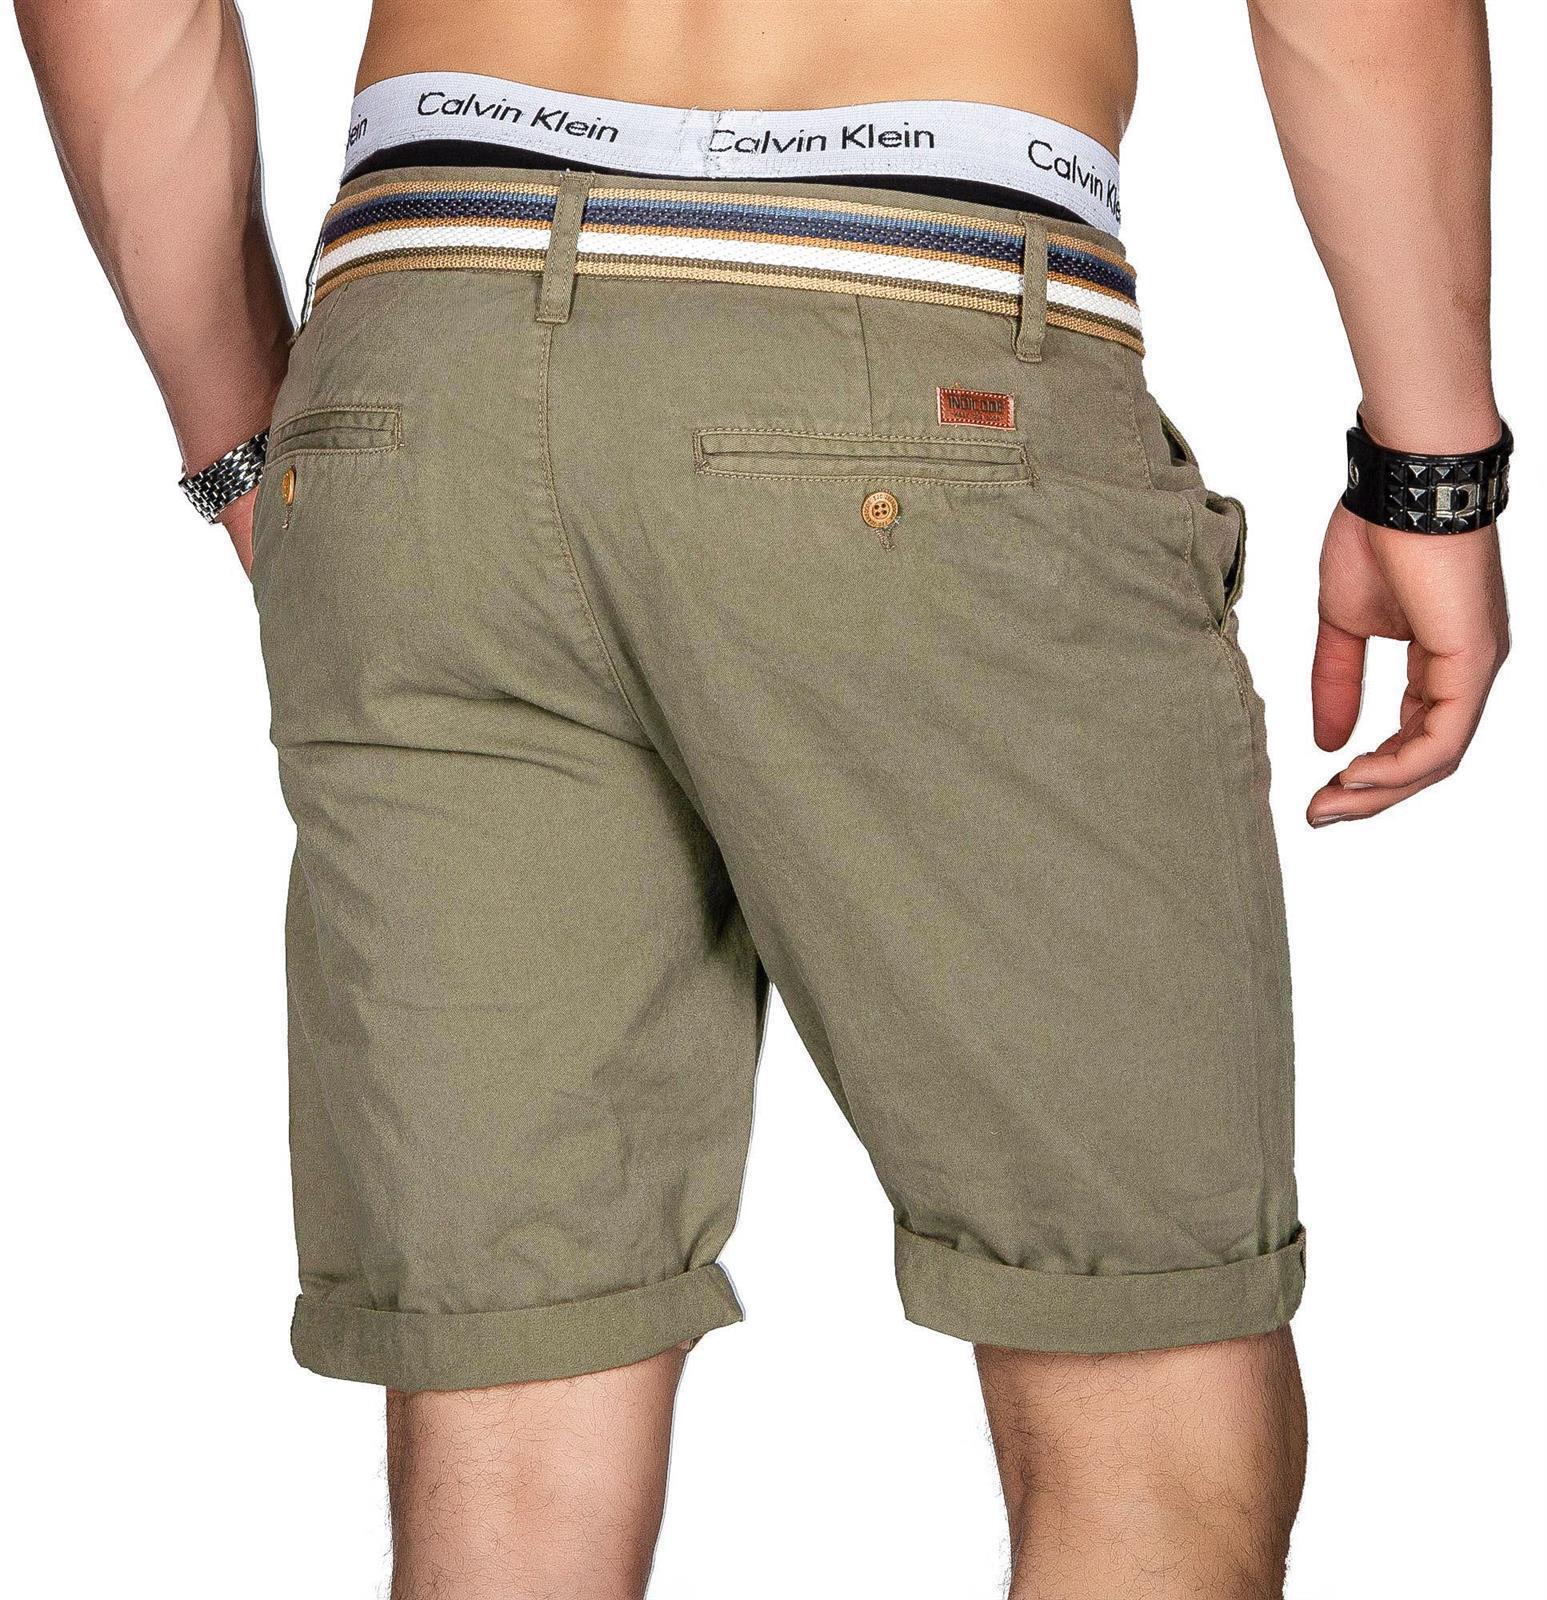 Indicode-Herren-Sommer-Bermuda-Chino-Shorts-kurze-Hose-Sommerhose-Short-NEU-B499 Indexbild 36